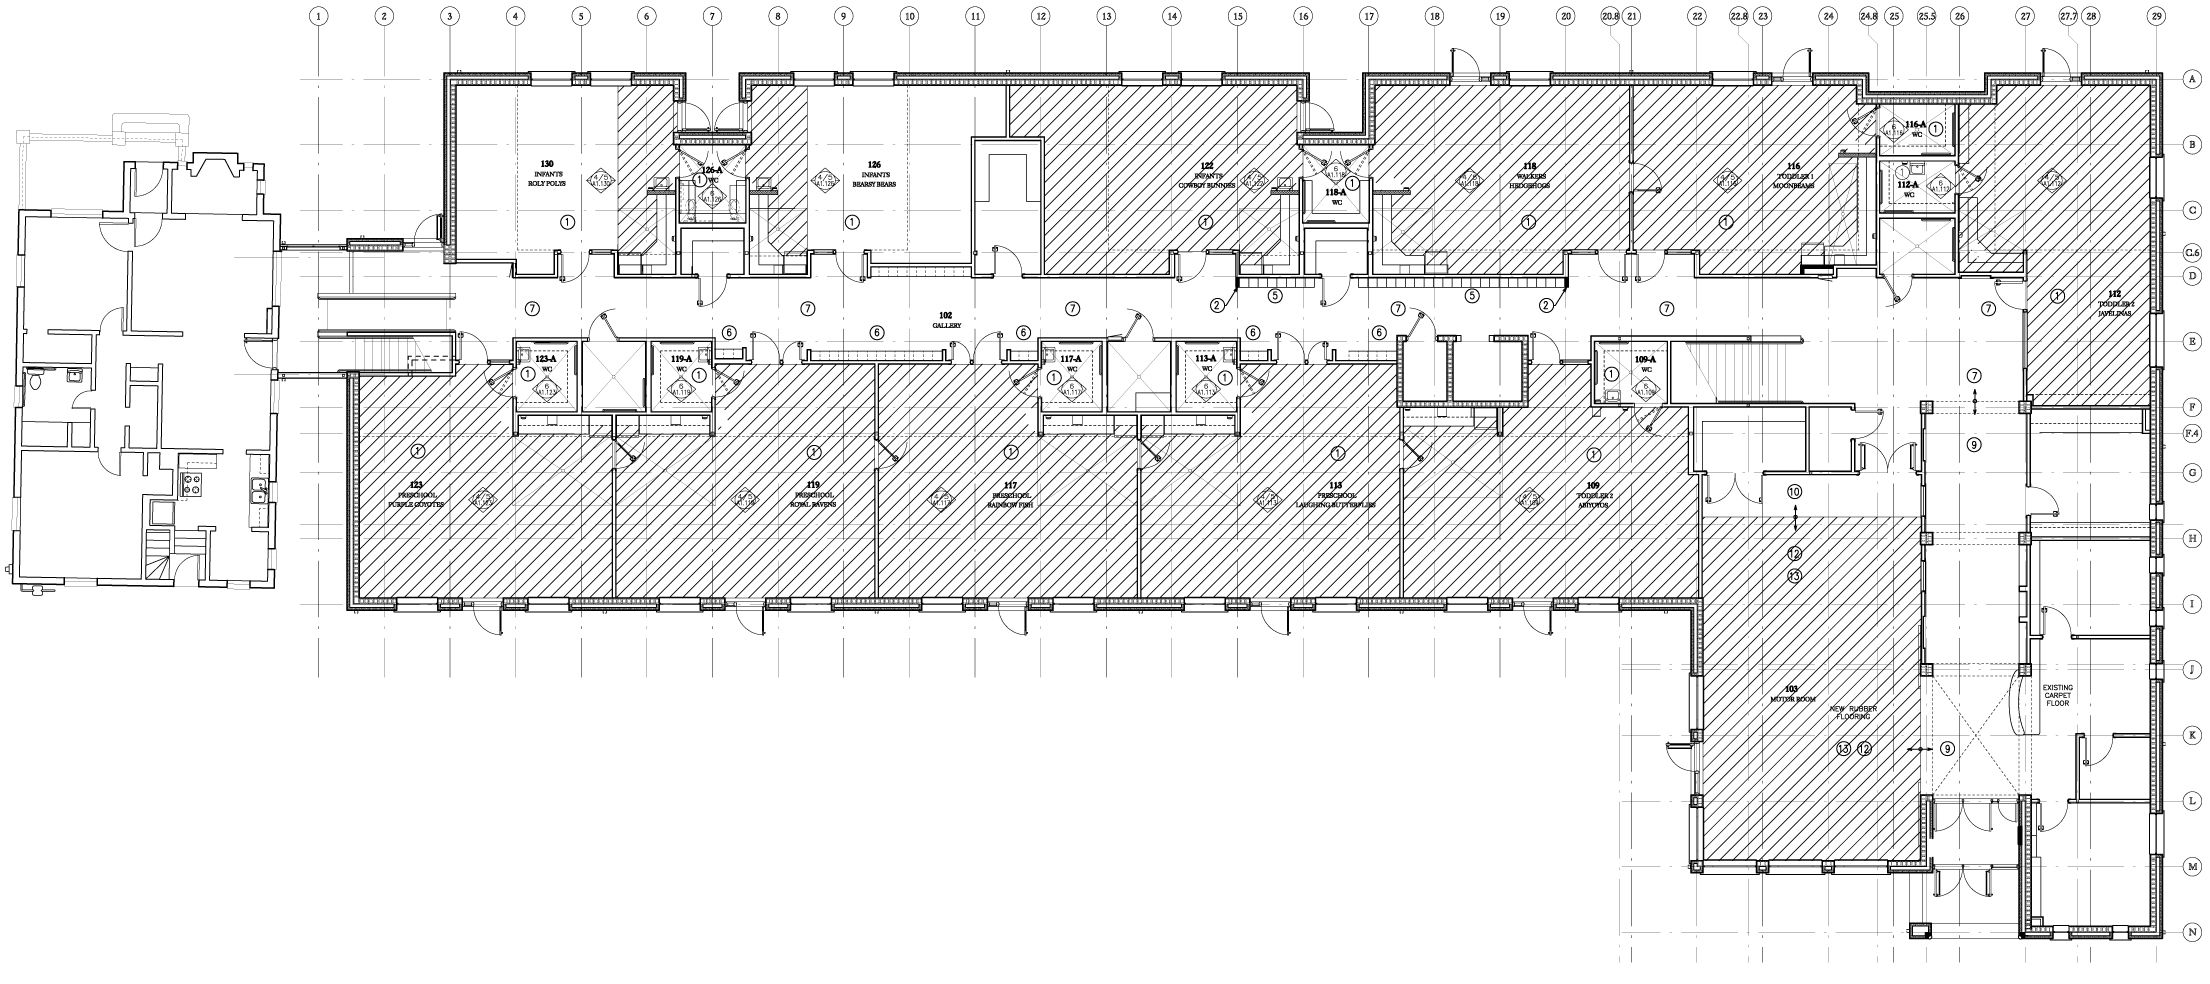 montessori school architectural plan Googleda Ara